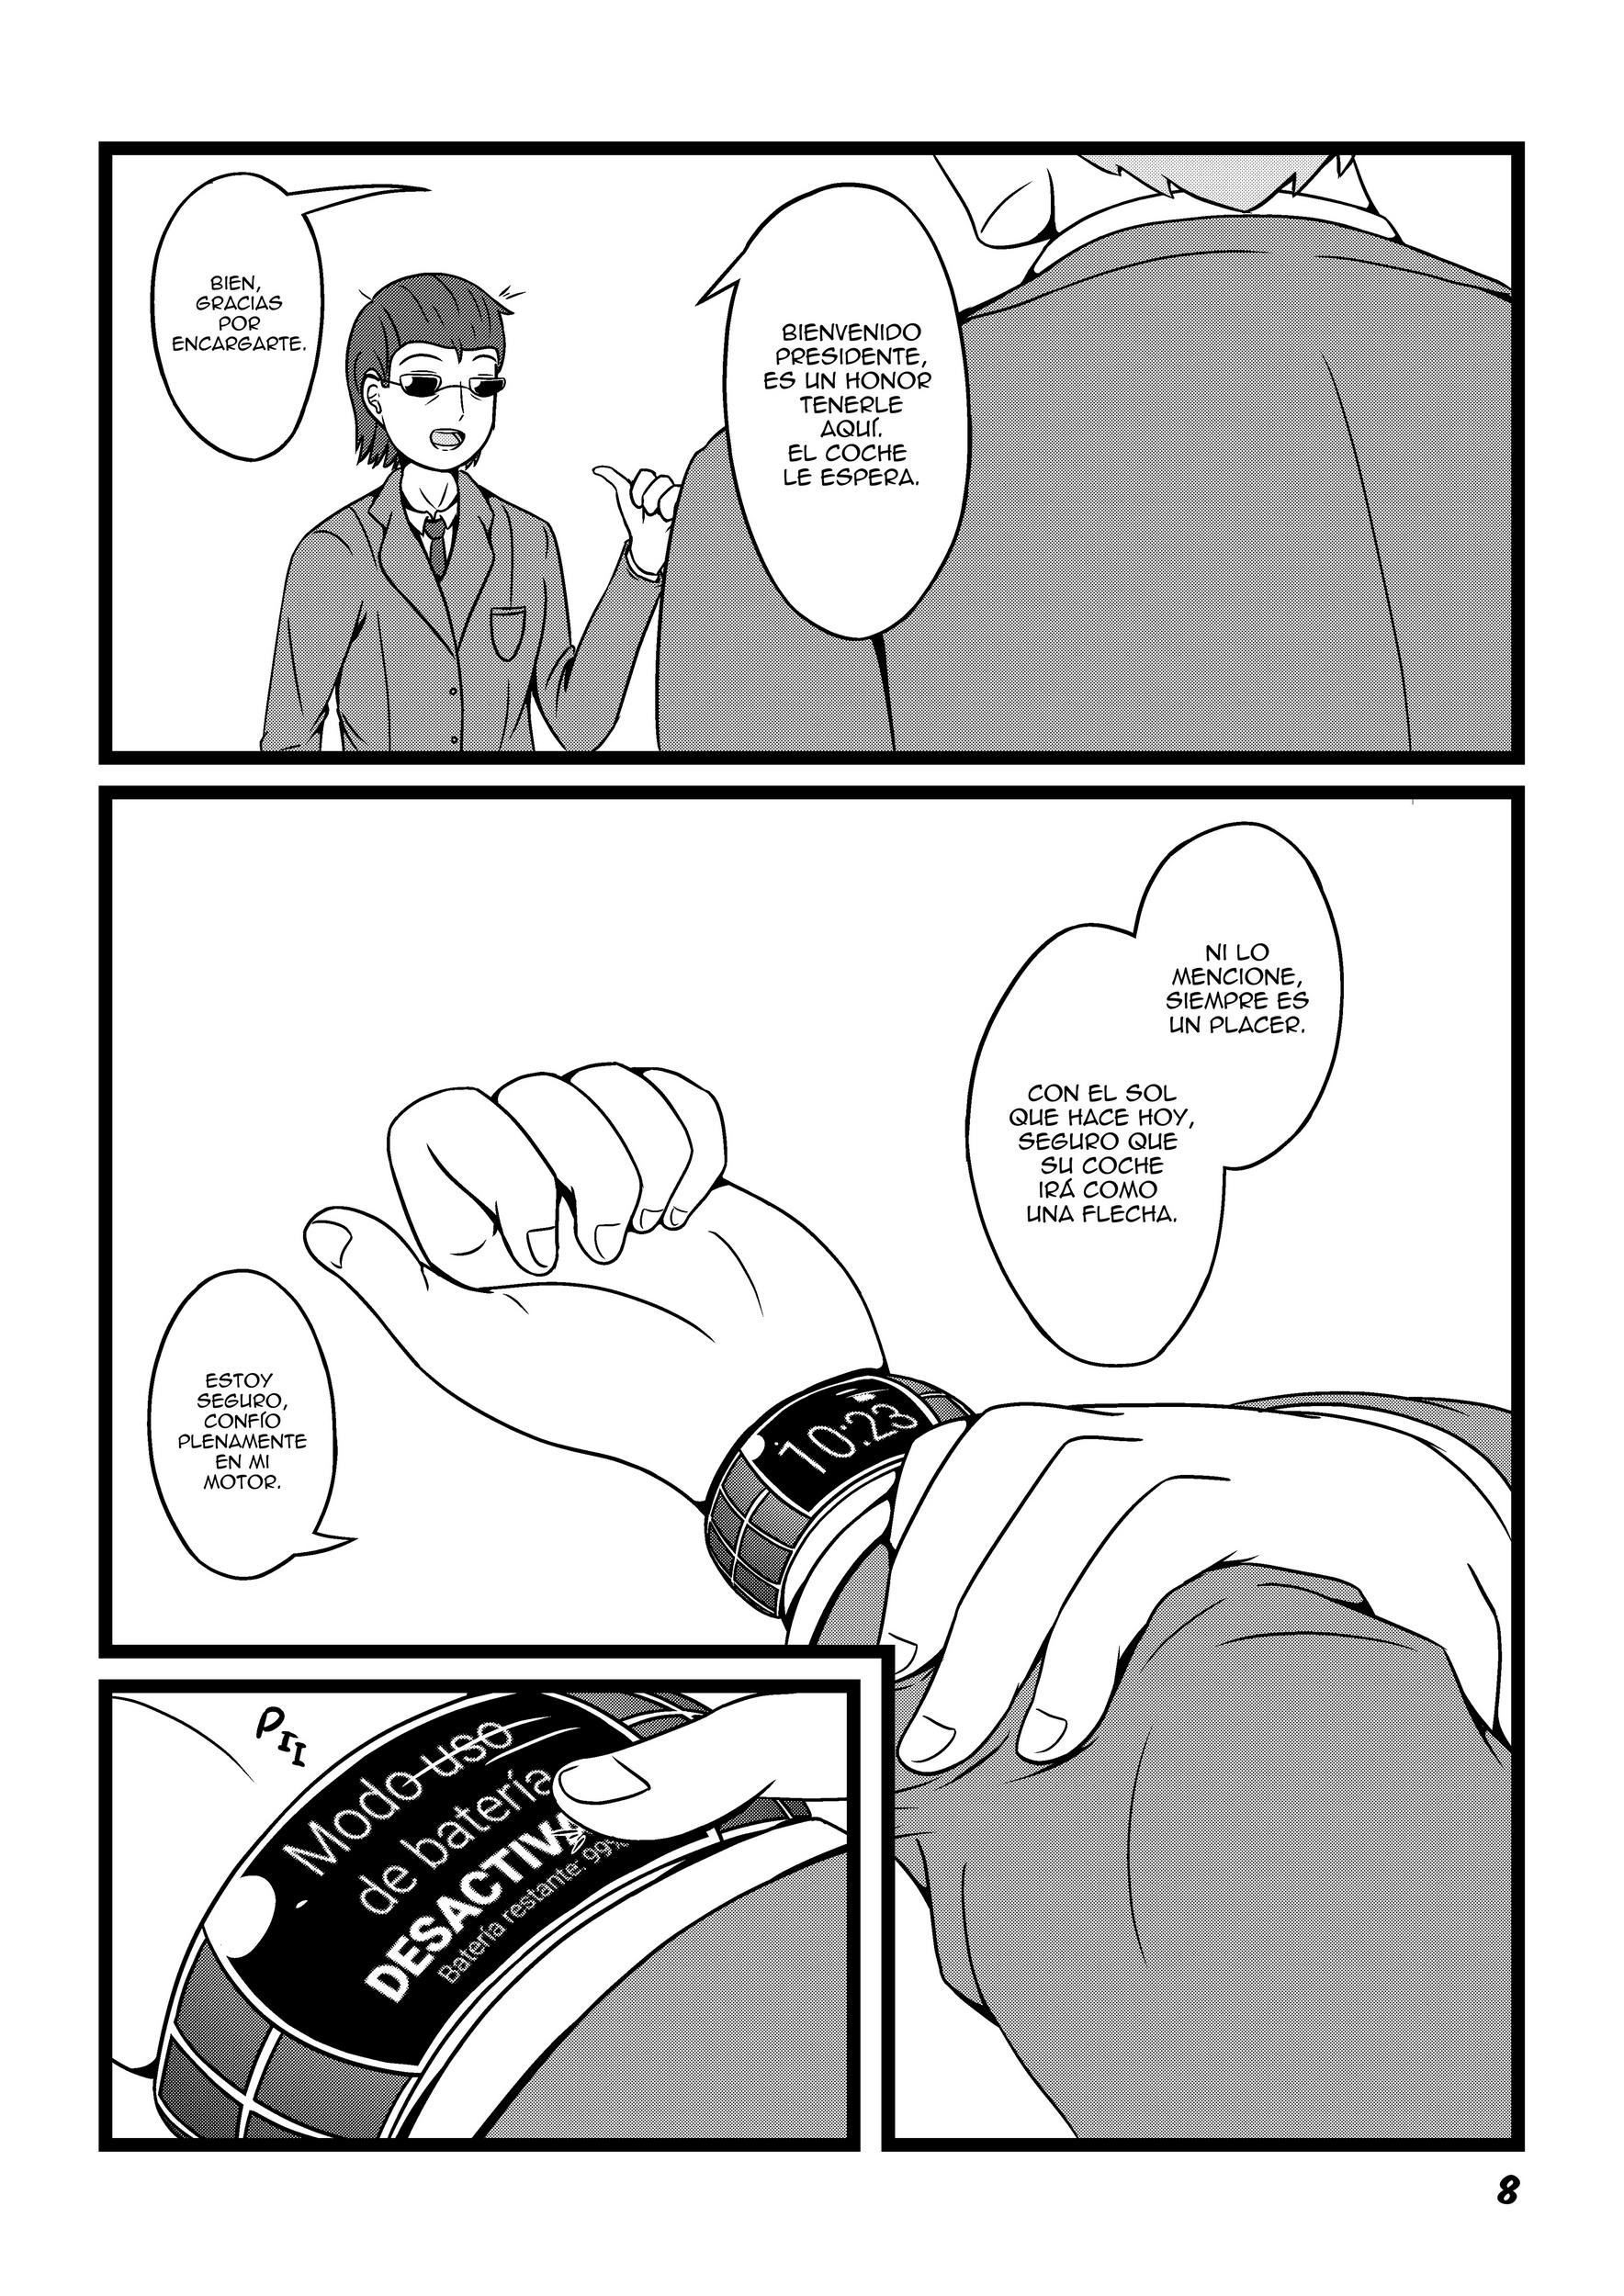 08_Fabián Molero_Manga Himako_008_2500_0056